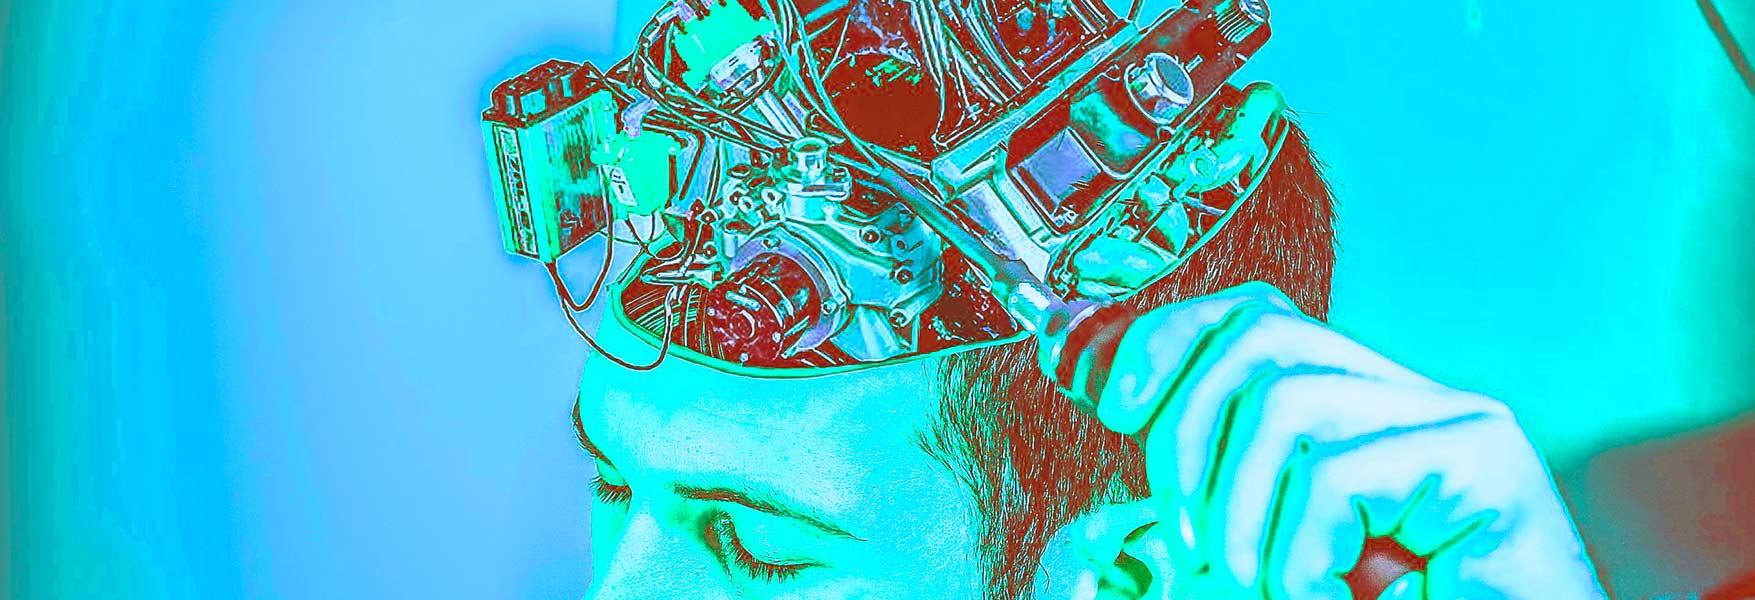 The Brain: 5 Scientific Advances that Are No Longer Science Fiction - OpenMind